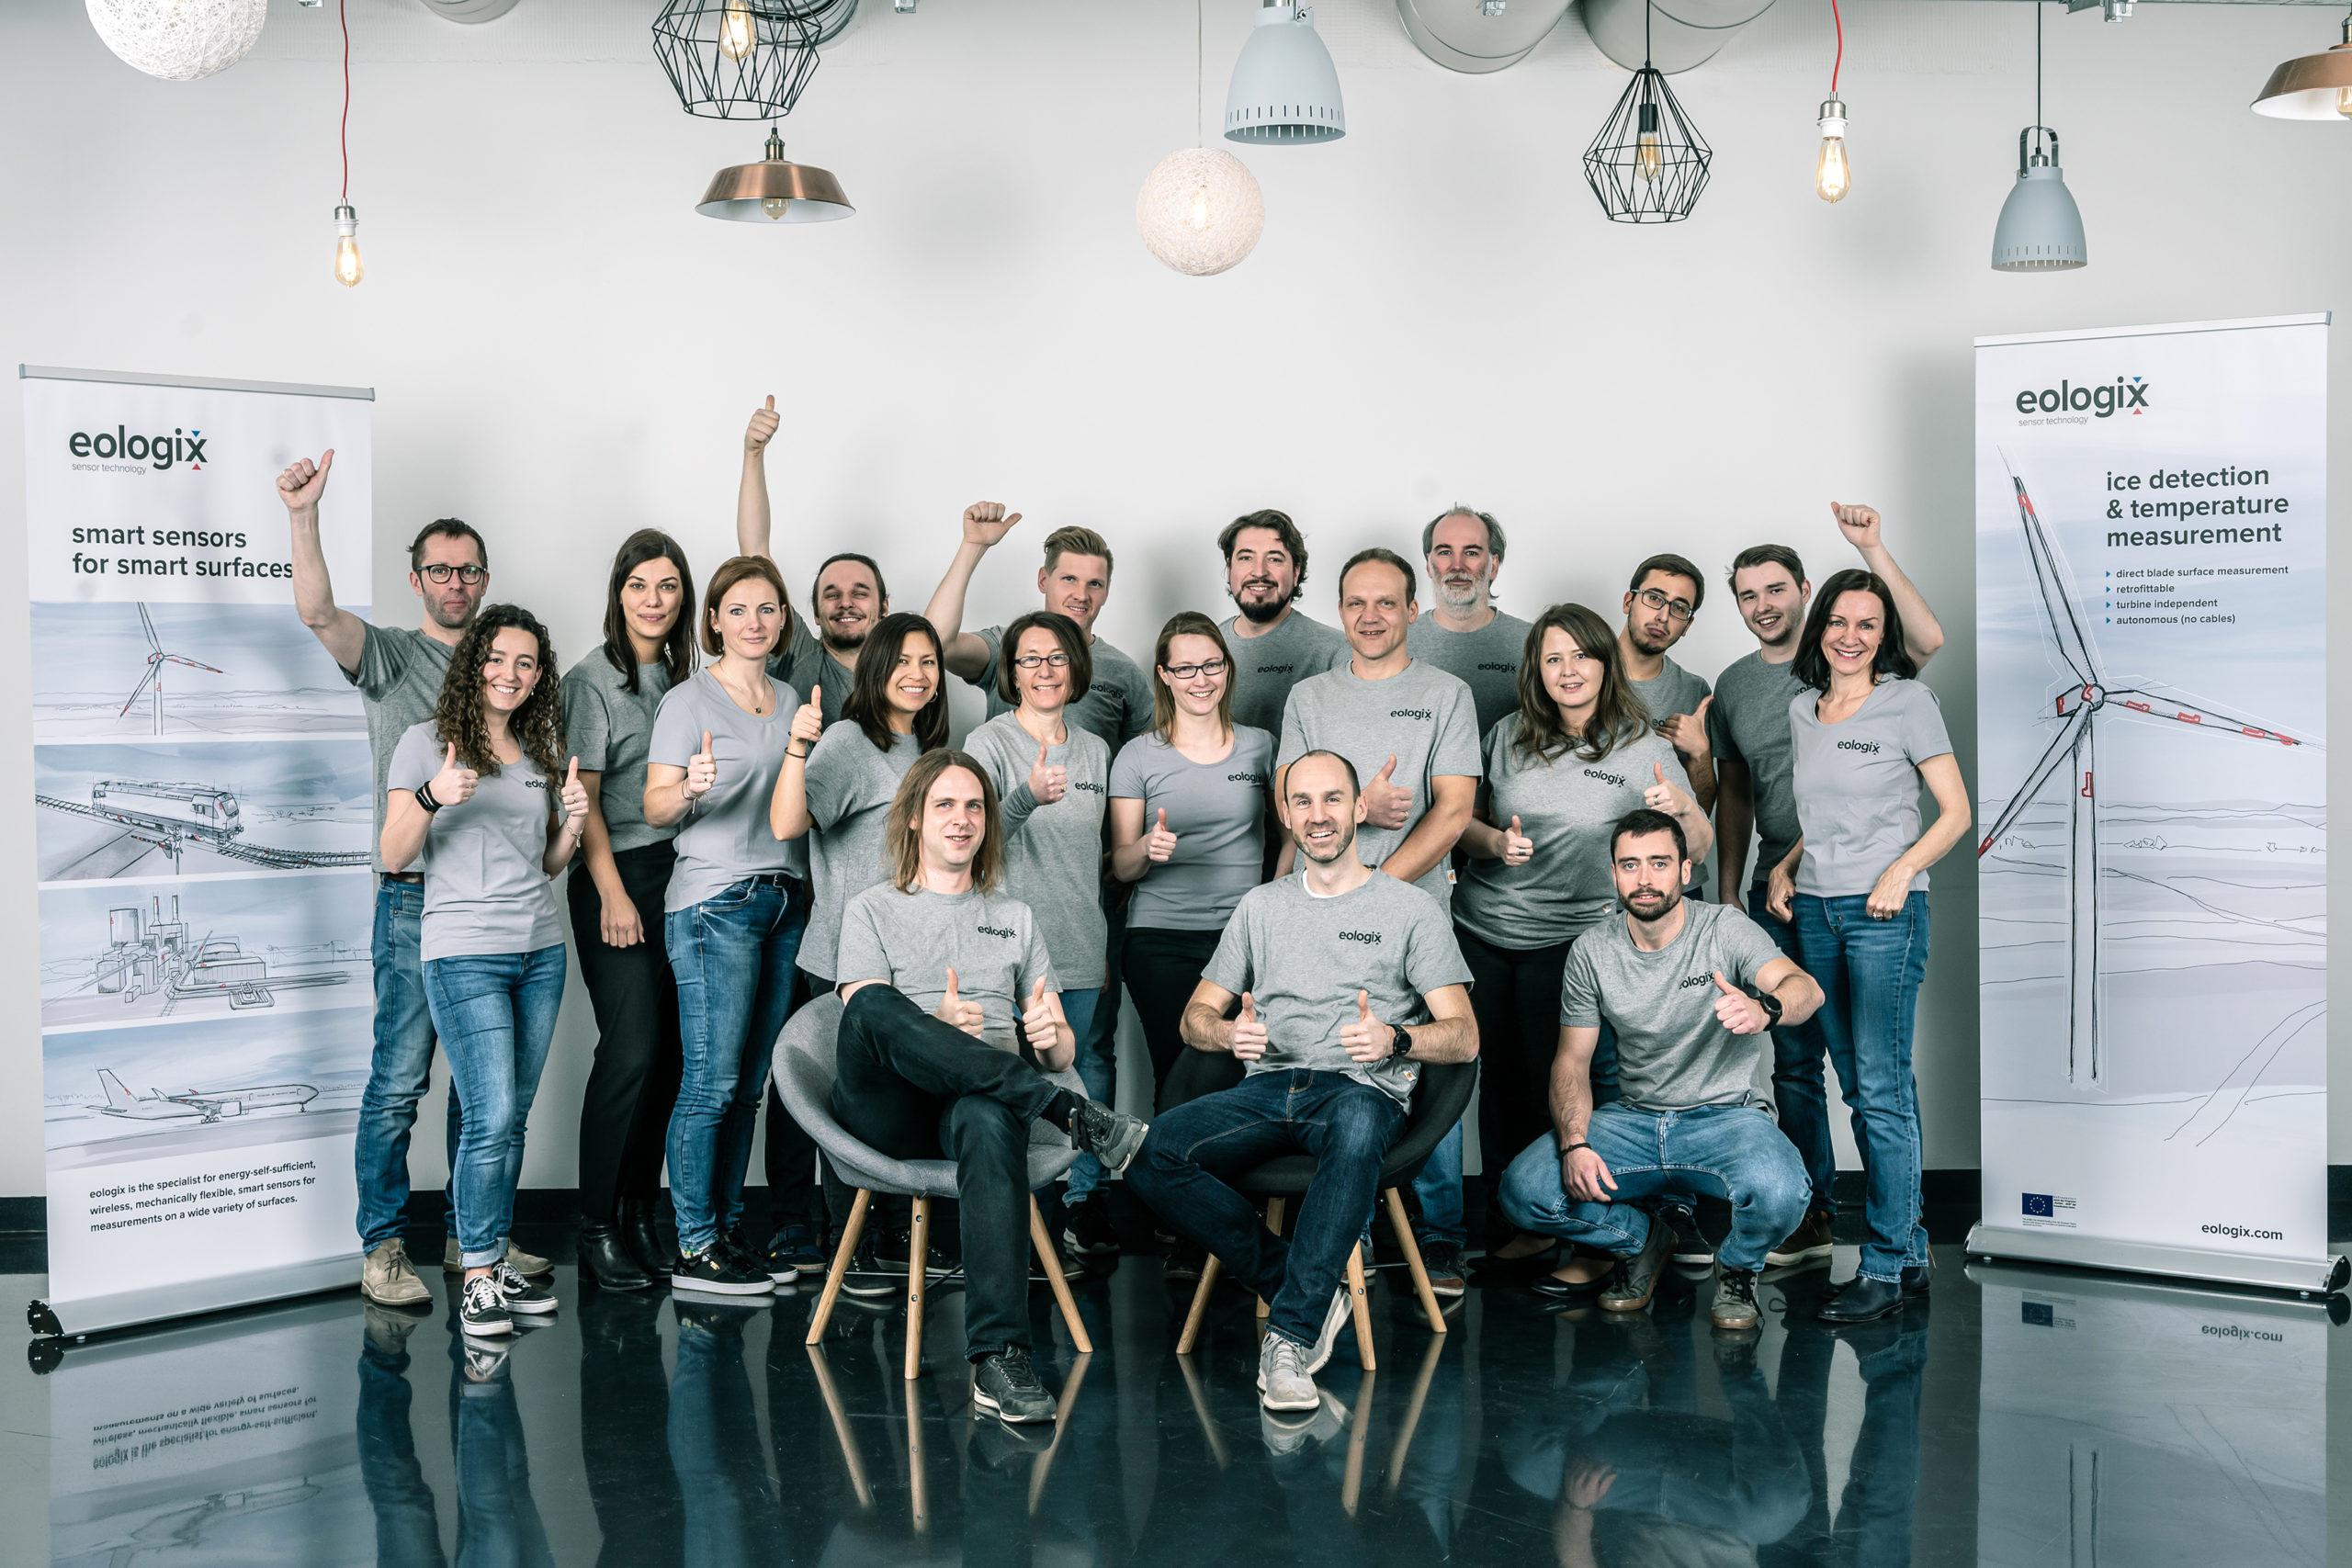 Das Team von eologix. © eologix sensor technology gmbh